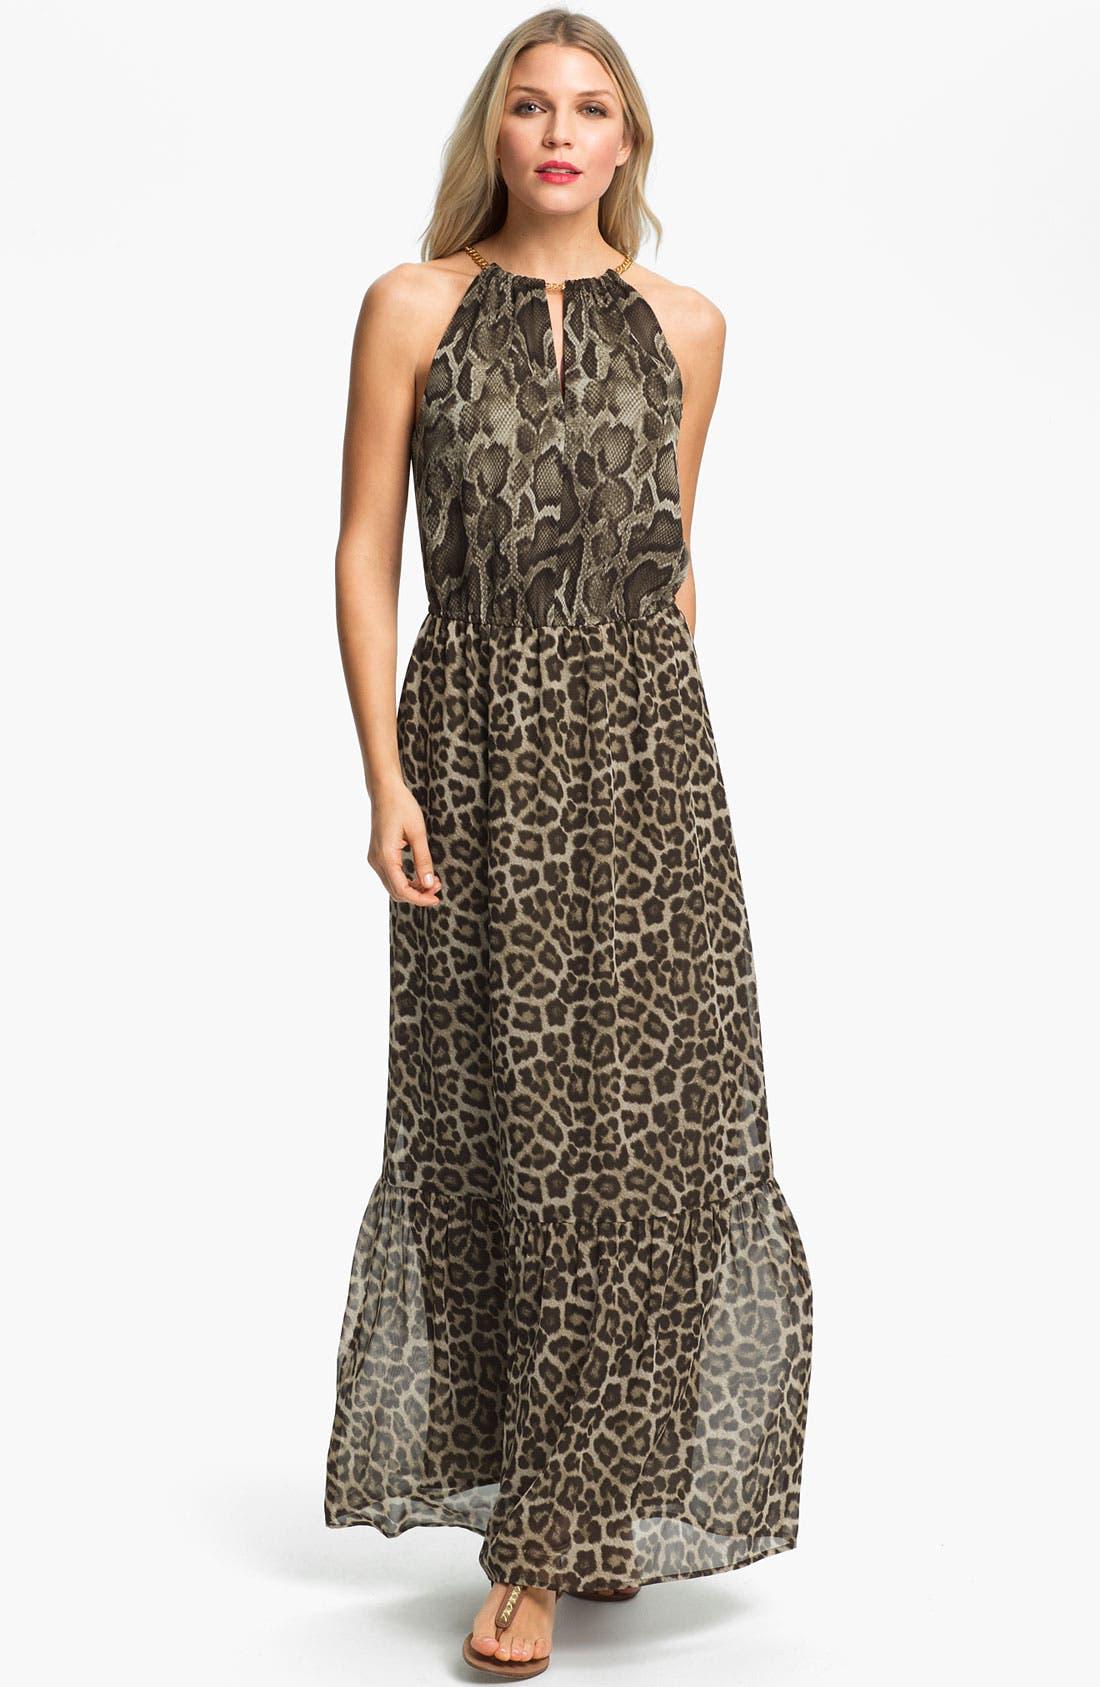 Alternate Image 1 Selected - MICHAEL Michael Kors 'Mamba' Print Maxi Dress